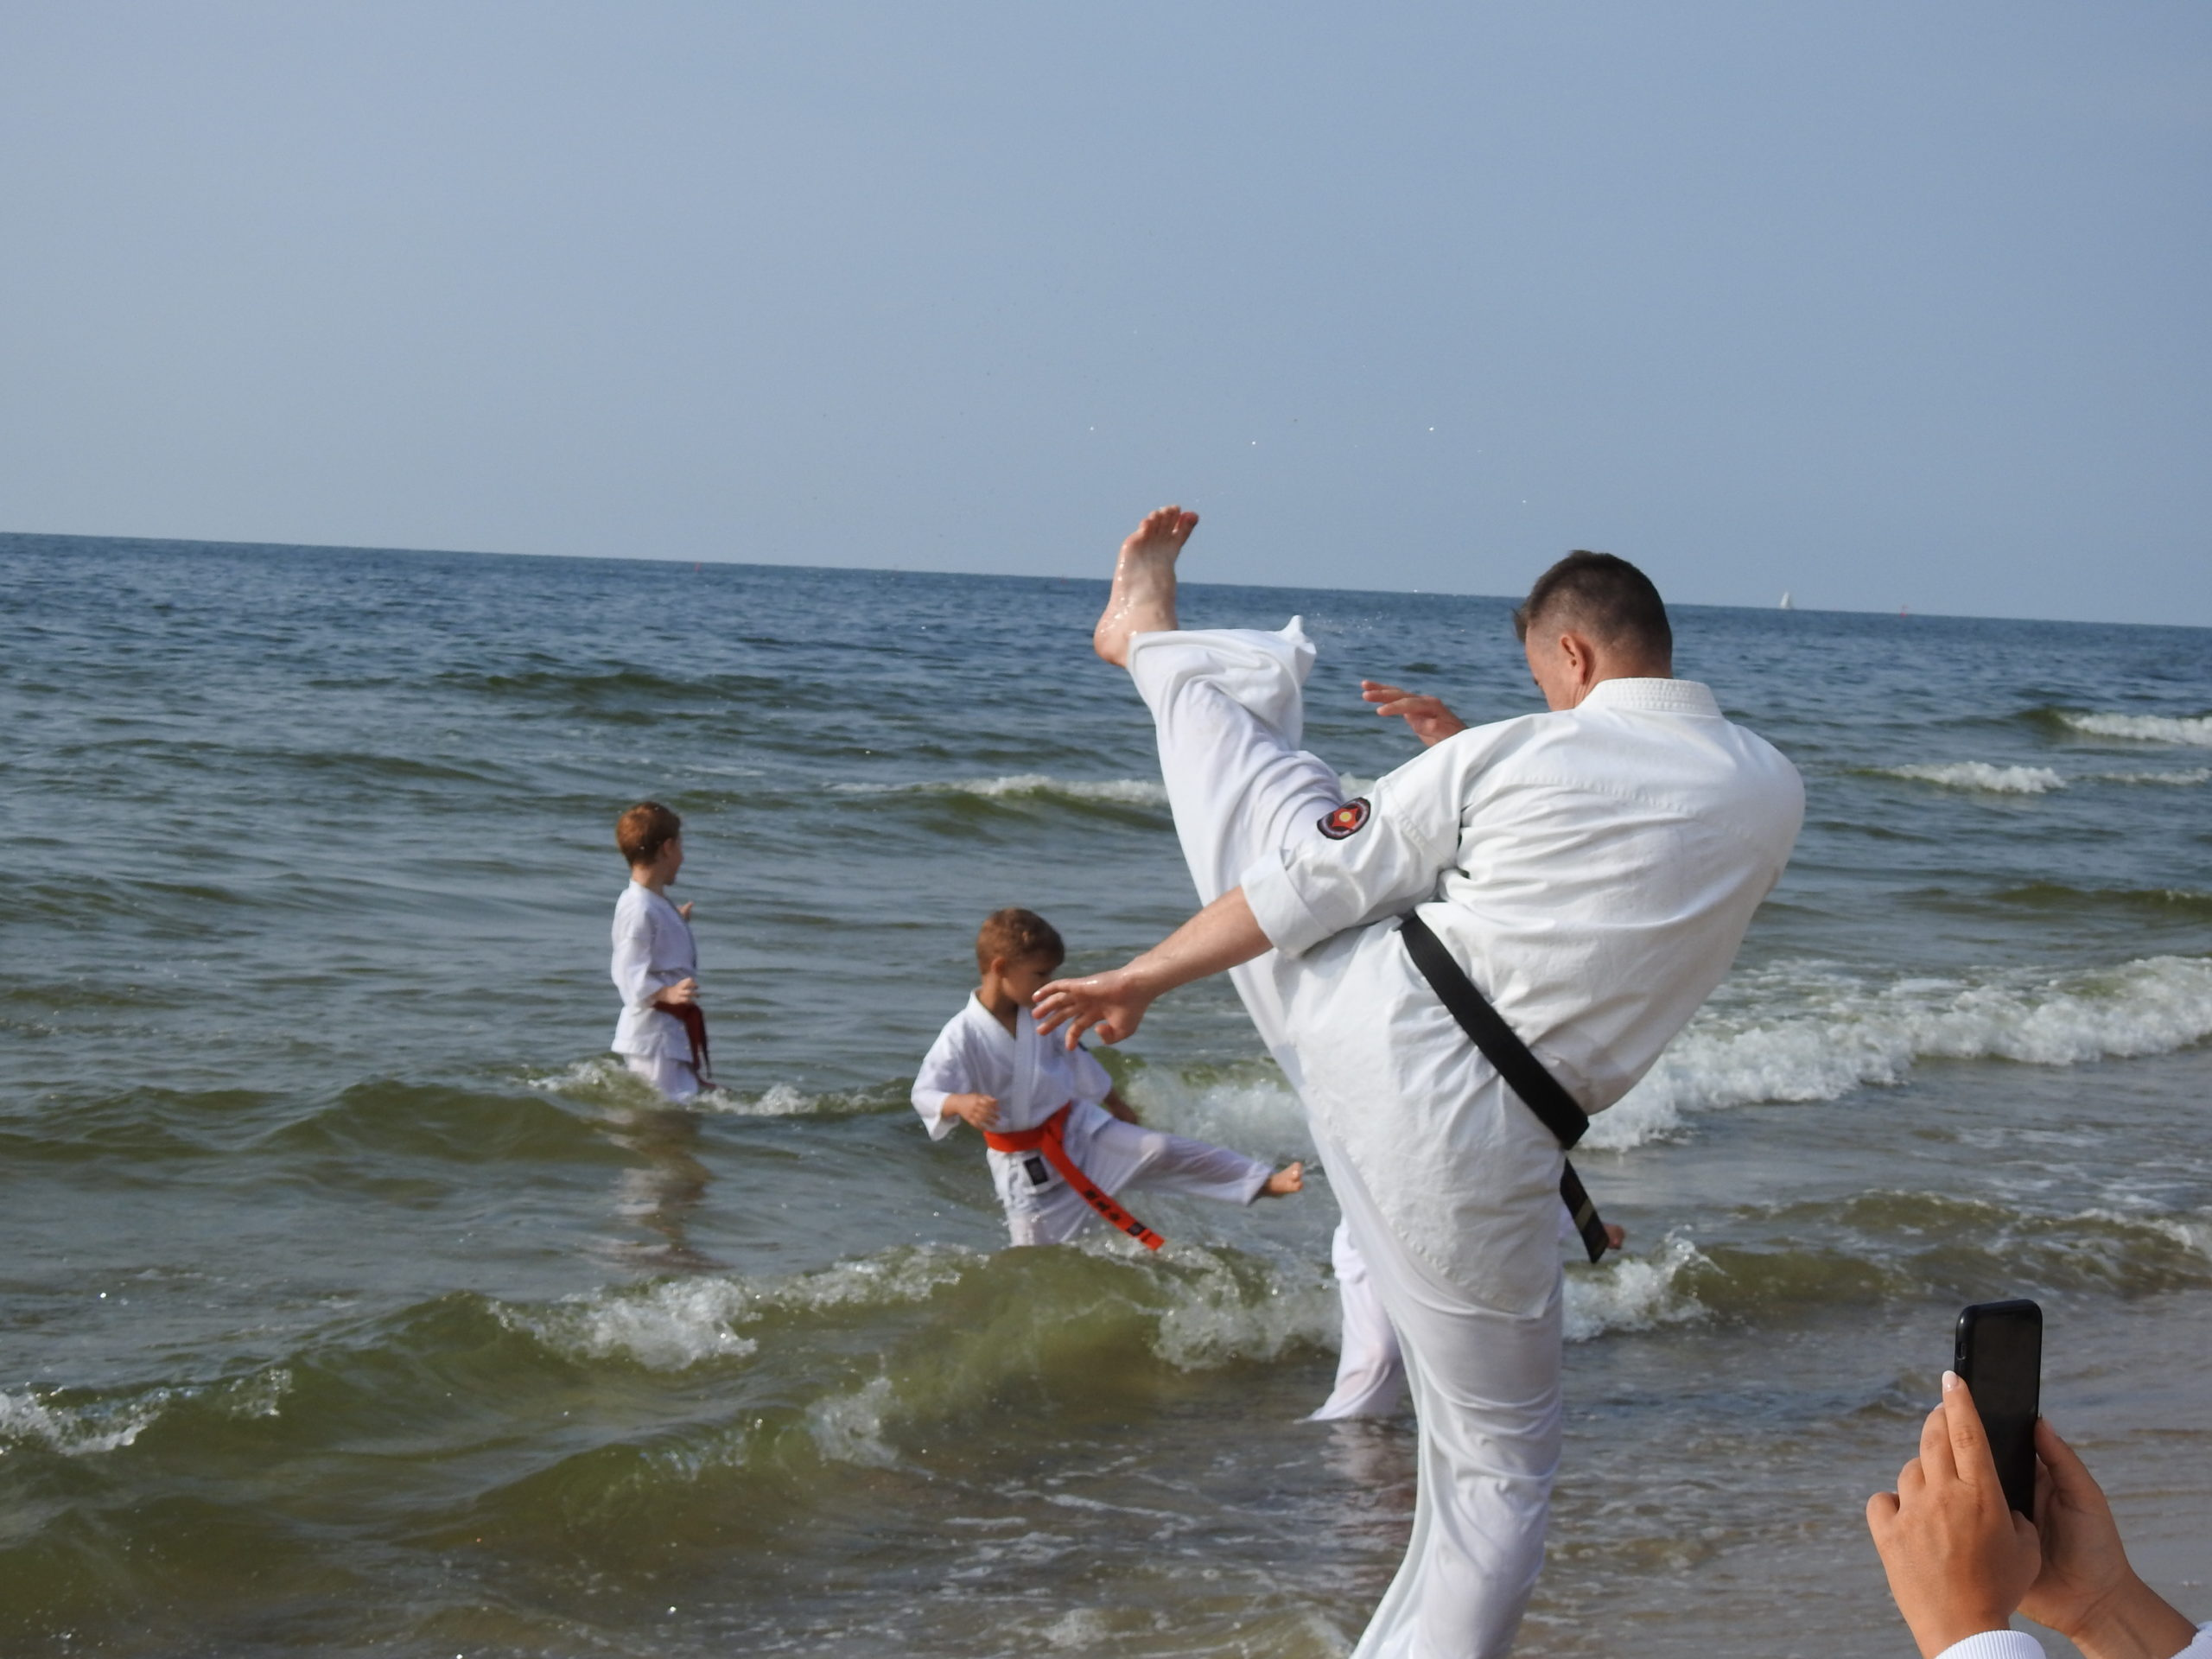 Trening na plaży.